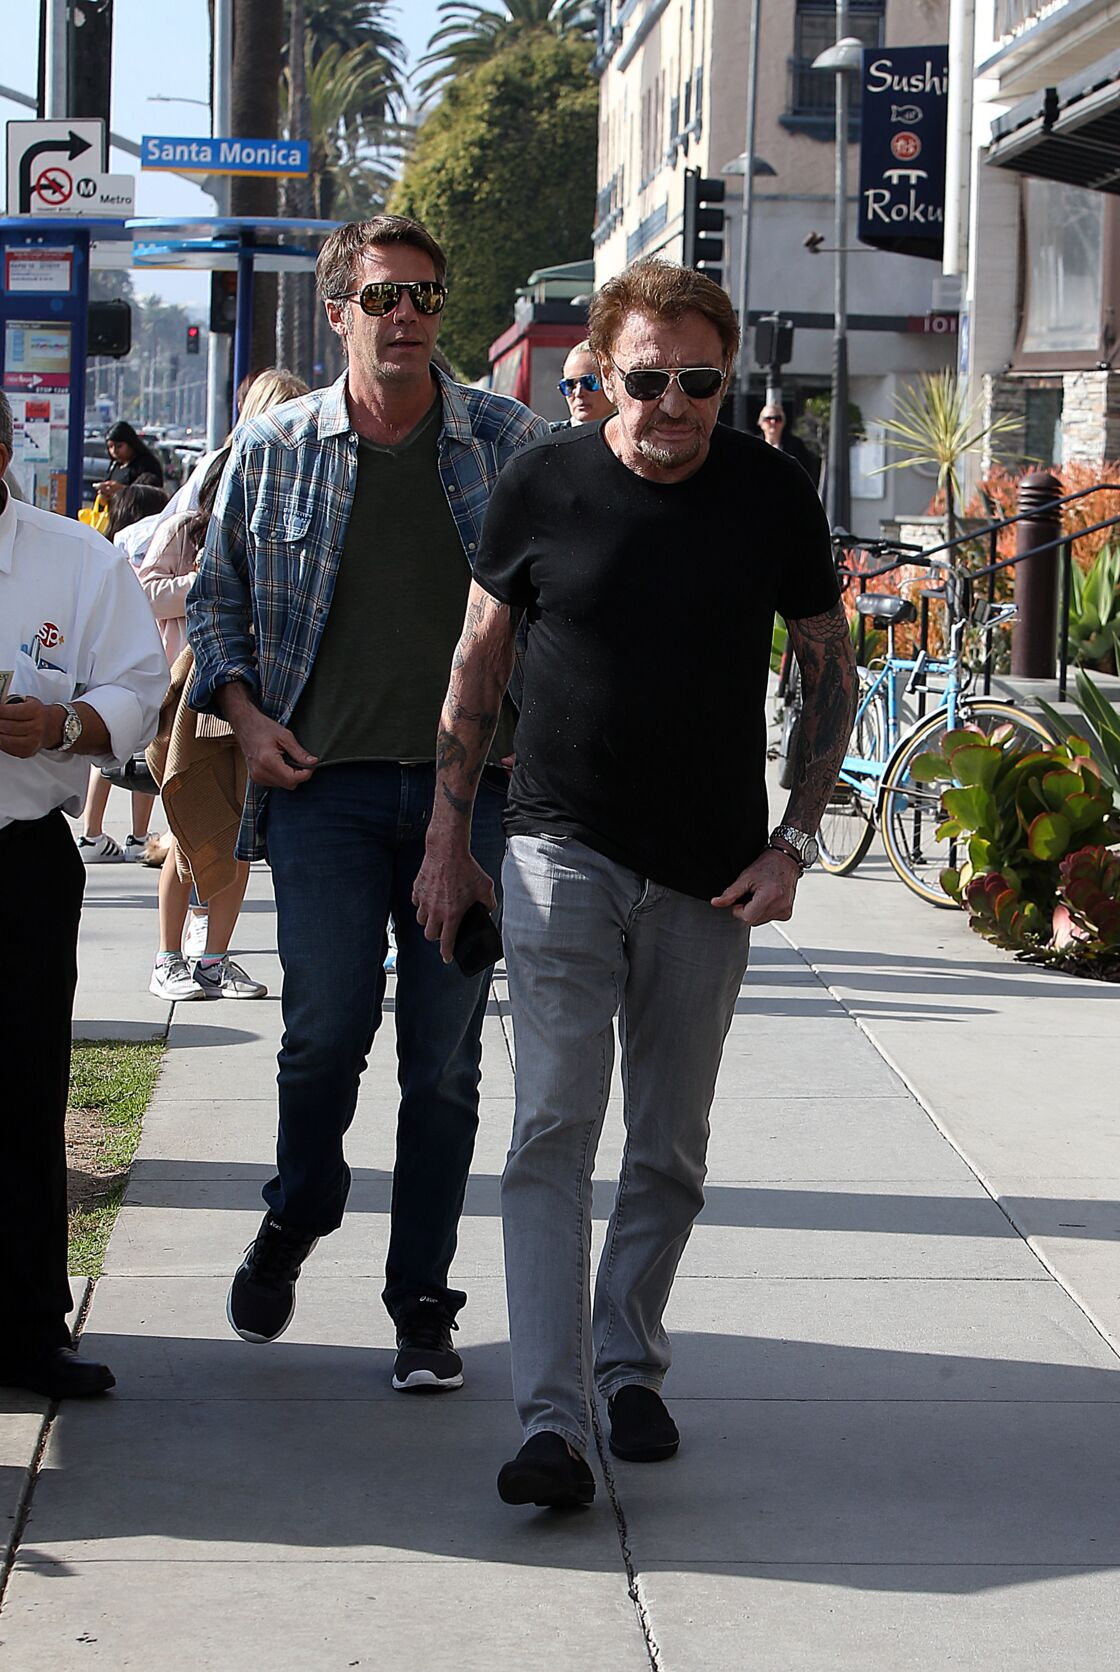 Emmanuel-Philibert de Savoie et Johnny Hallyday au Water Grill de Santa Monica le 18 mars 2017